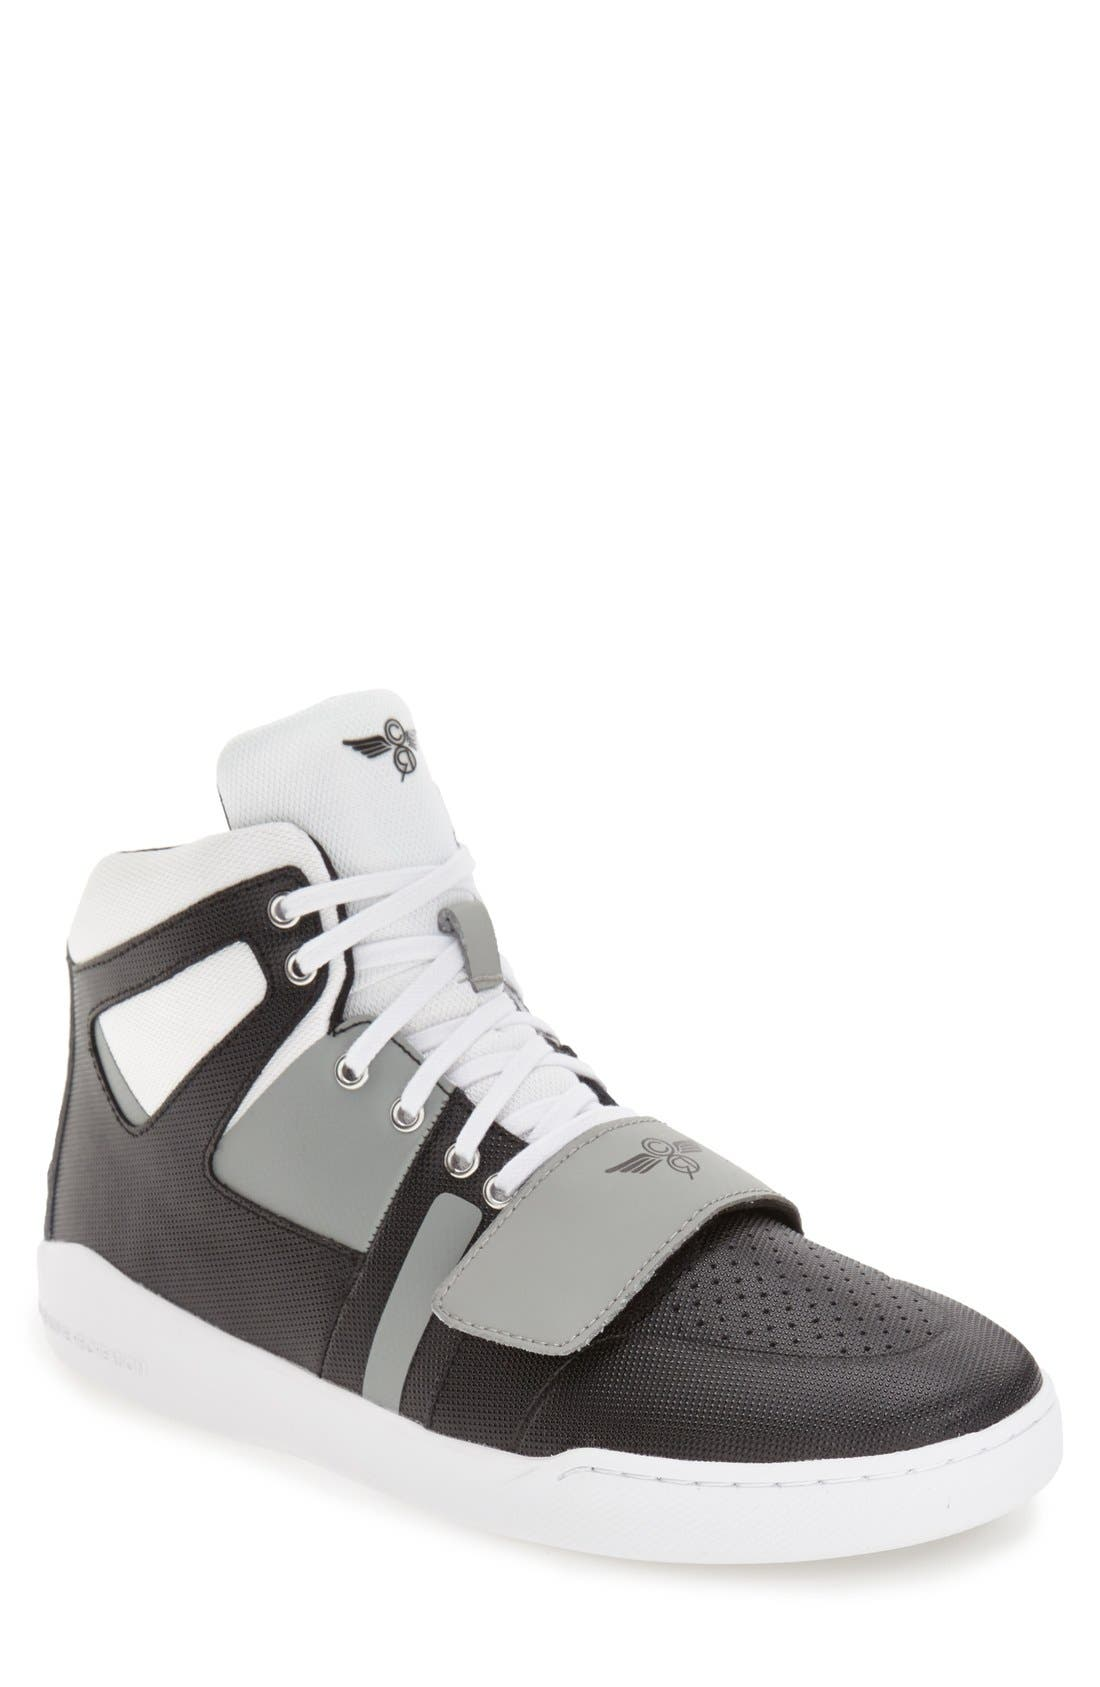 Alternate Image 1 Selected - Creative Recreation 'Manzo' Sneaker (Men)